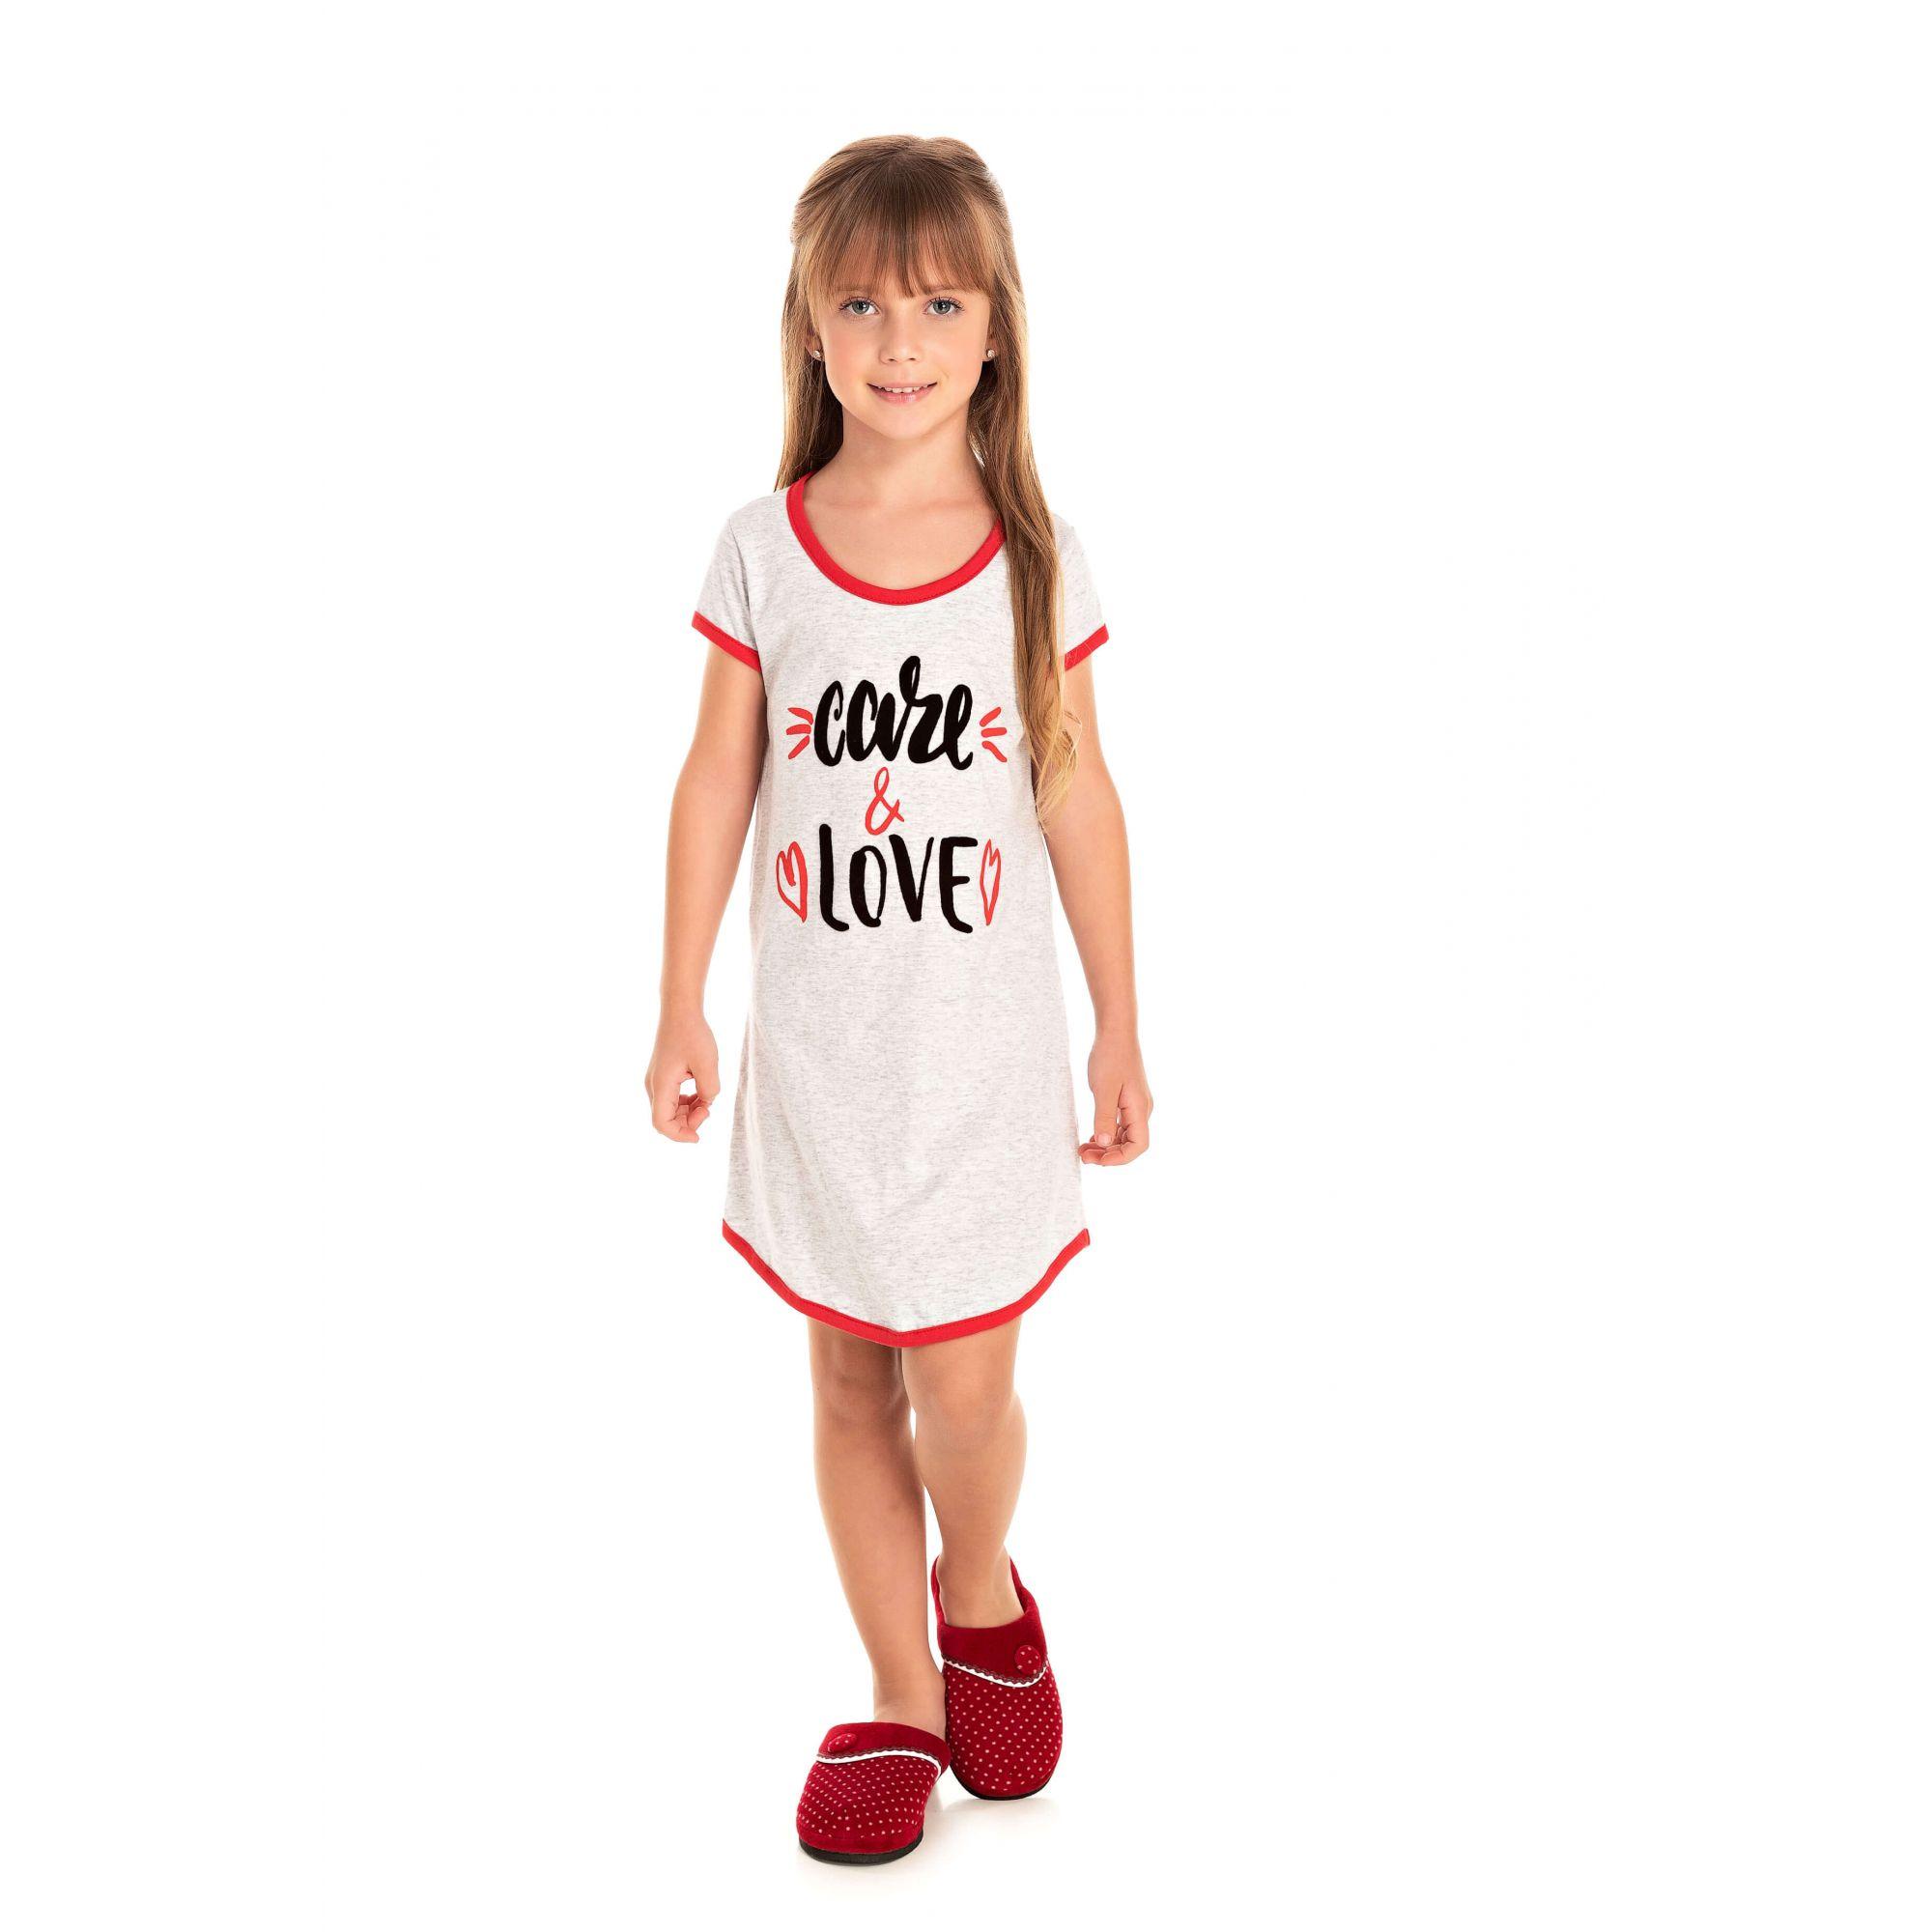 029 - Camisola Infantil Feminino Care & Love